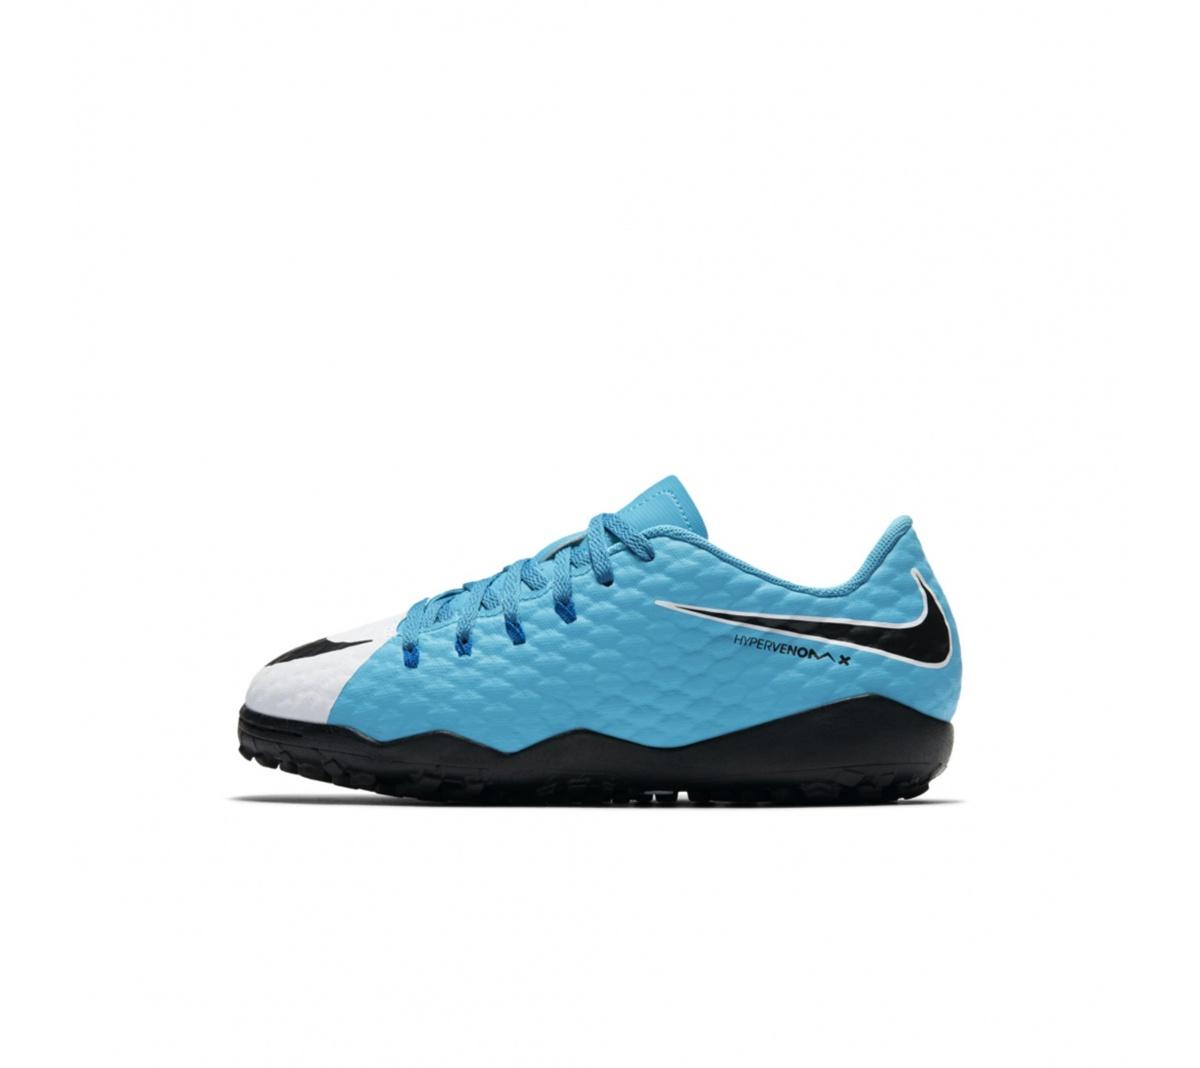 ... Chuteira Nike HypervenomX Phelon III TF Infantil Azul e Branco ... 91f6770490b8d